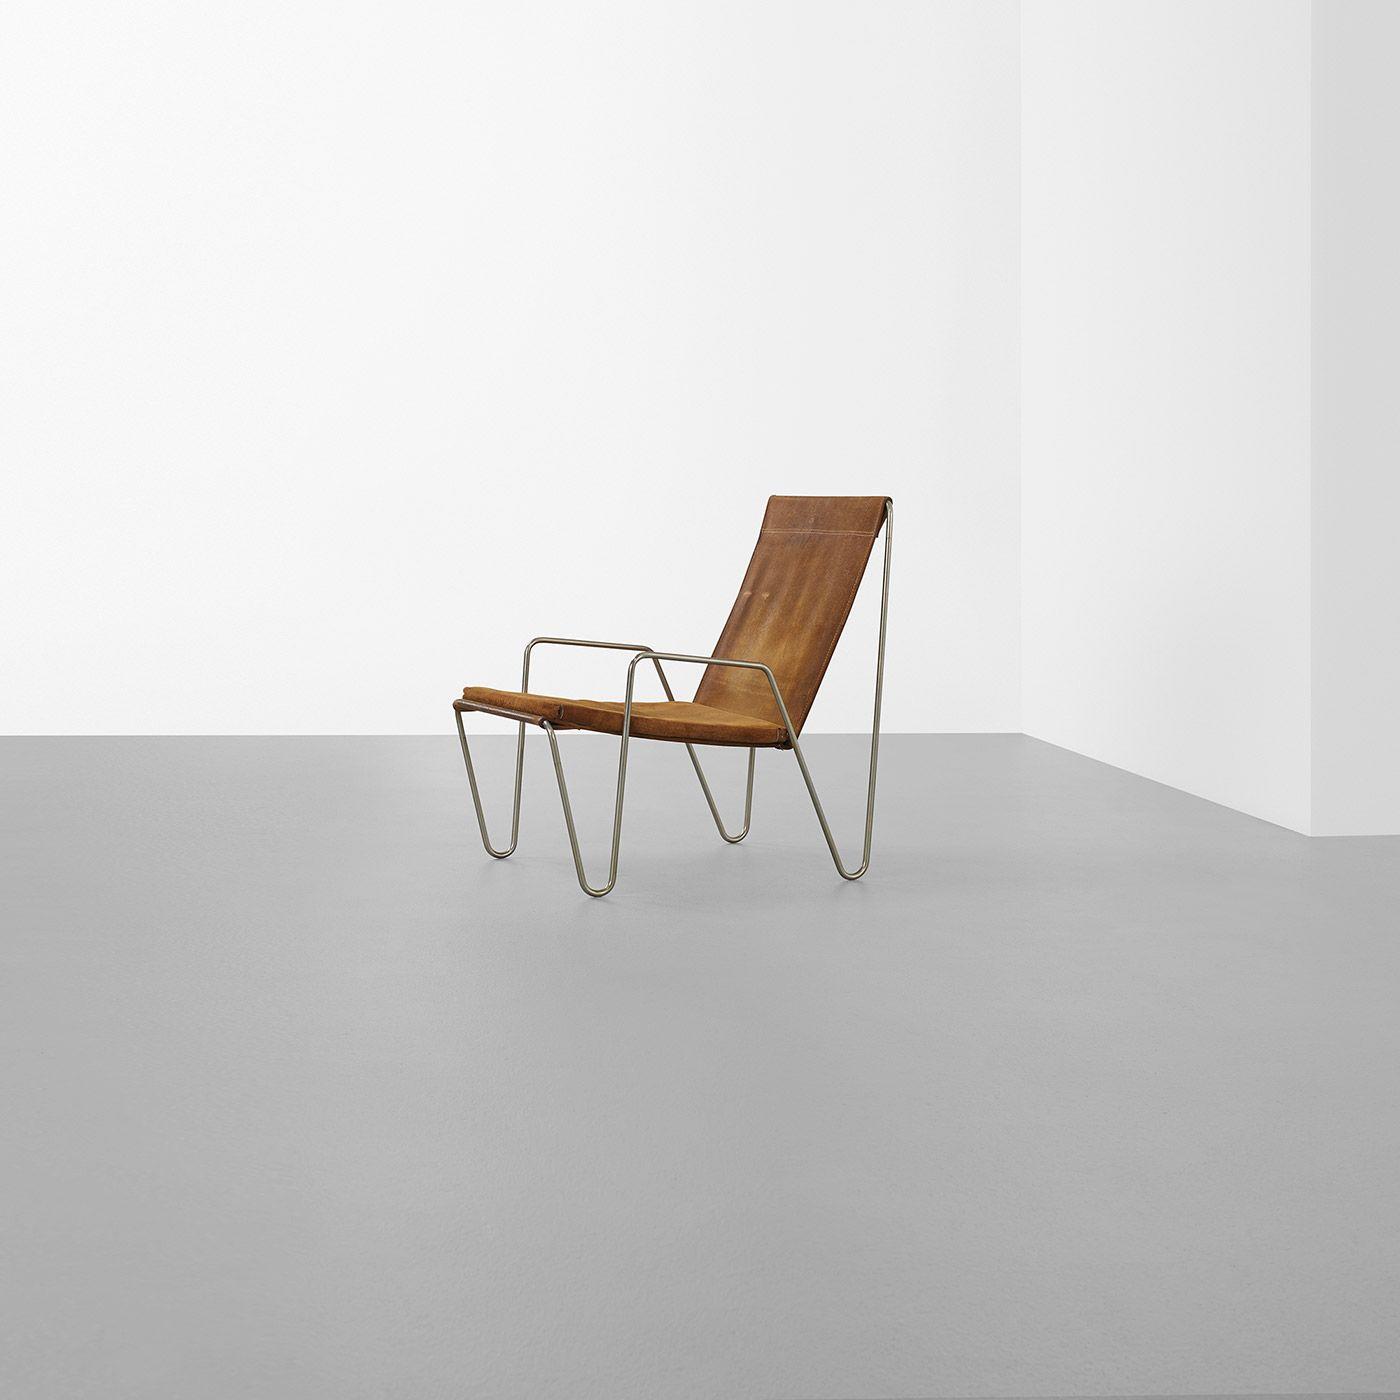 287: Verner Panton Bachelor chair, model 3351 < Living